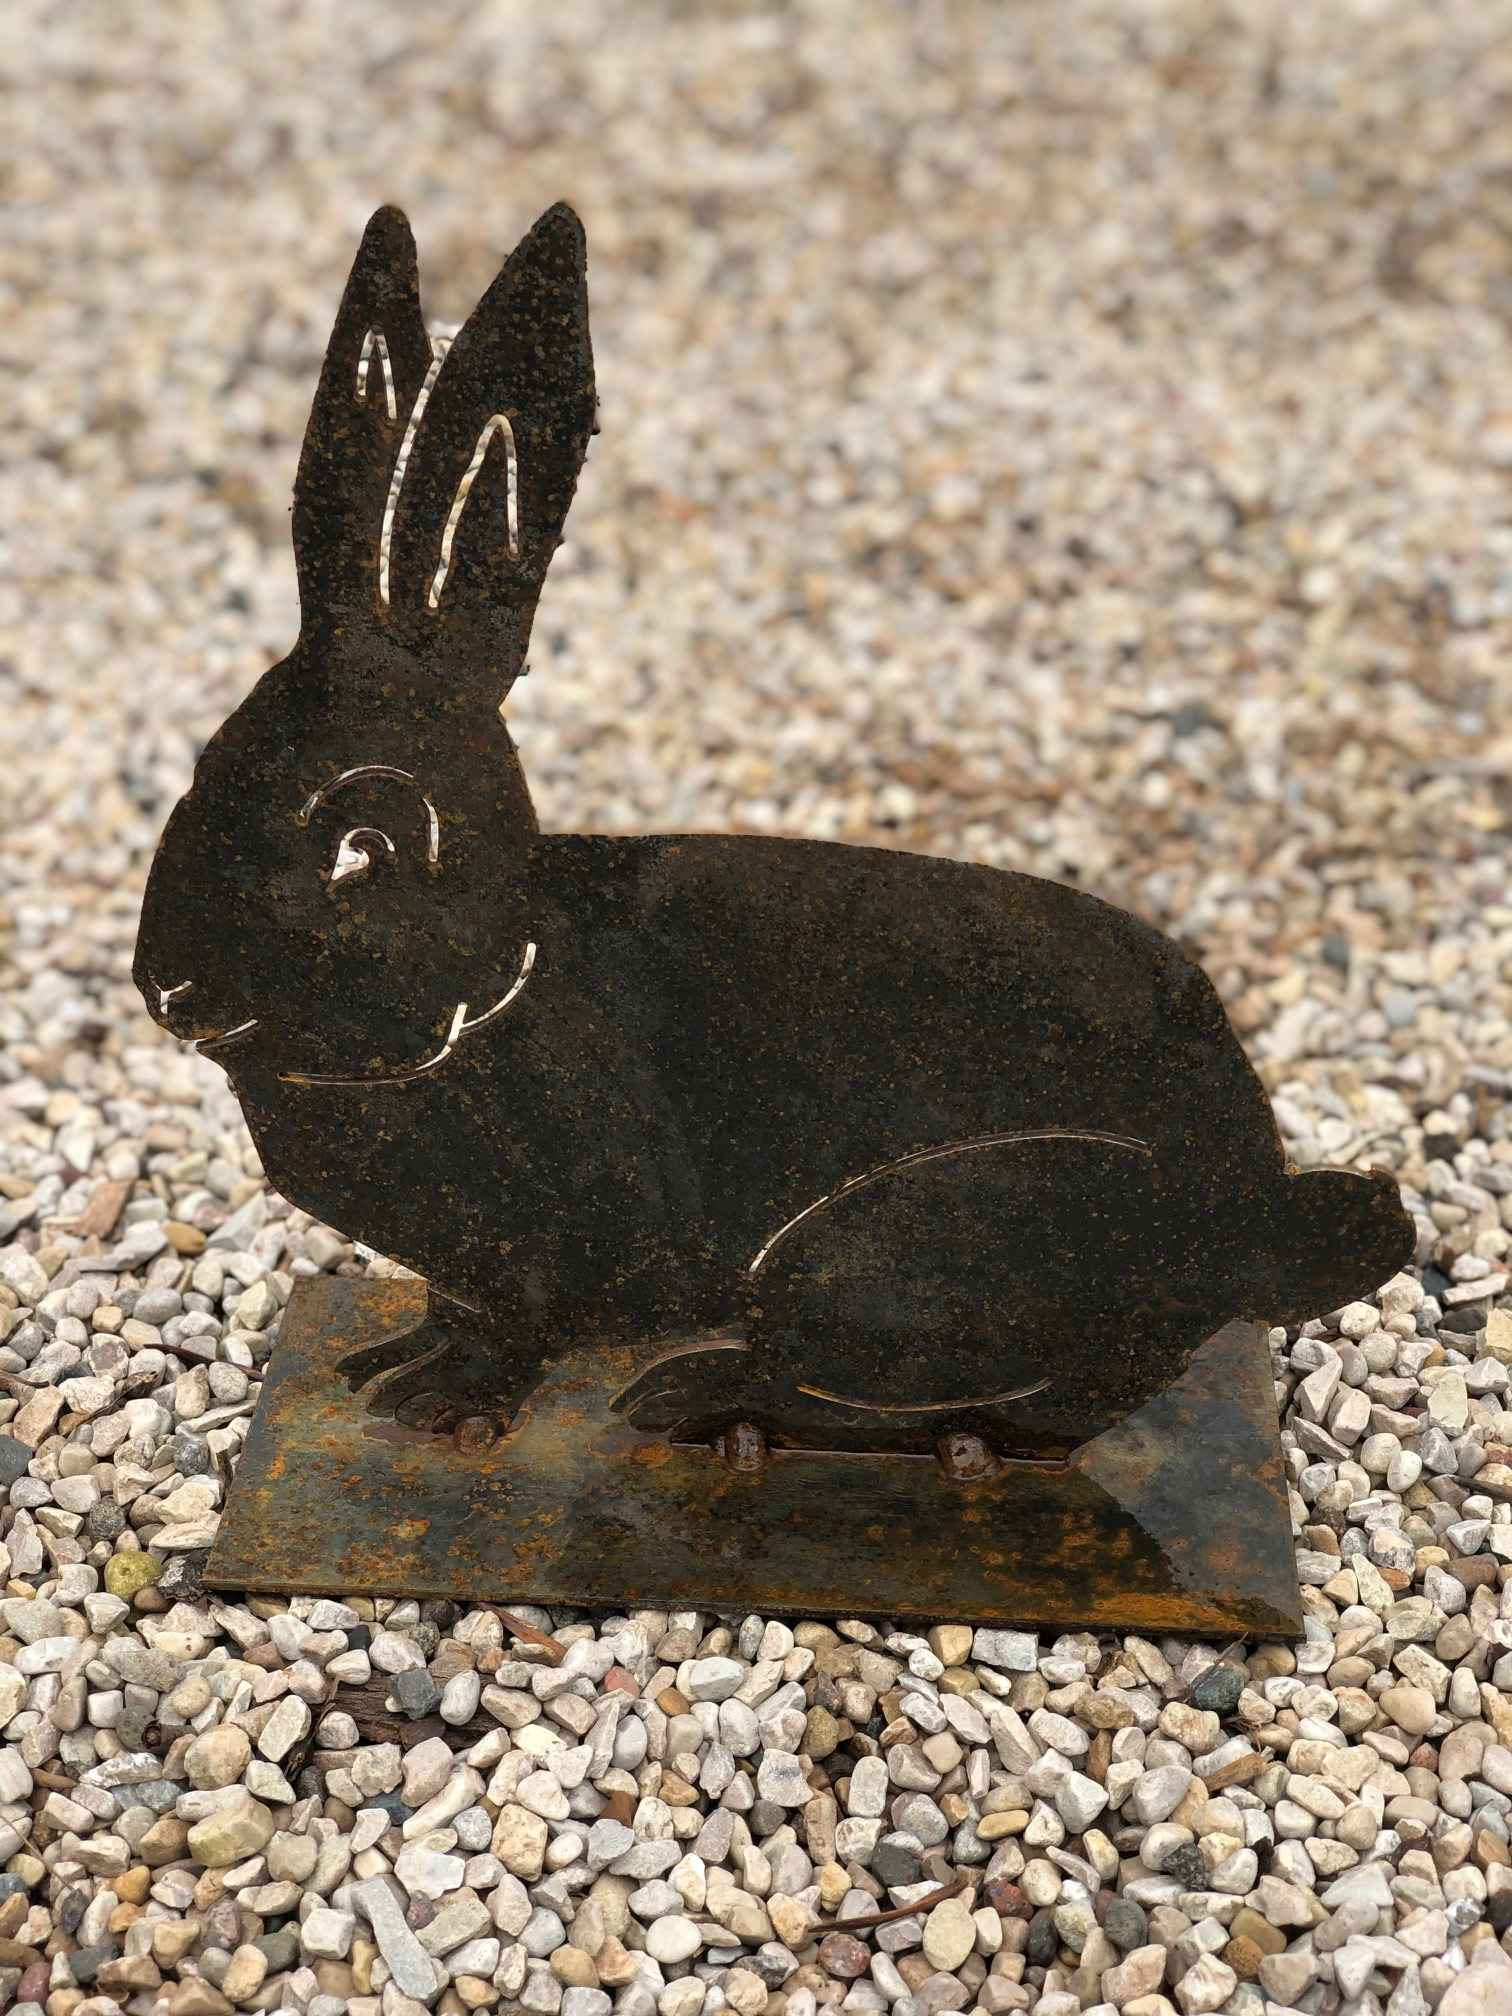 Audrey Tabletop Rabbit